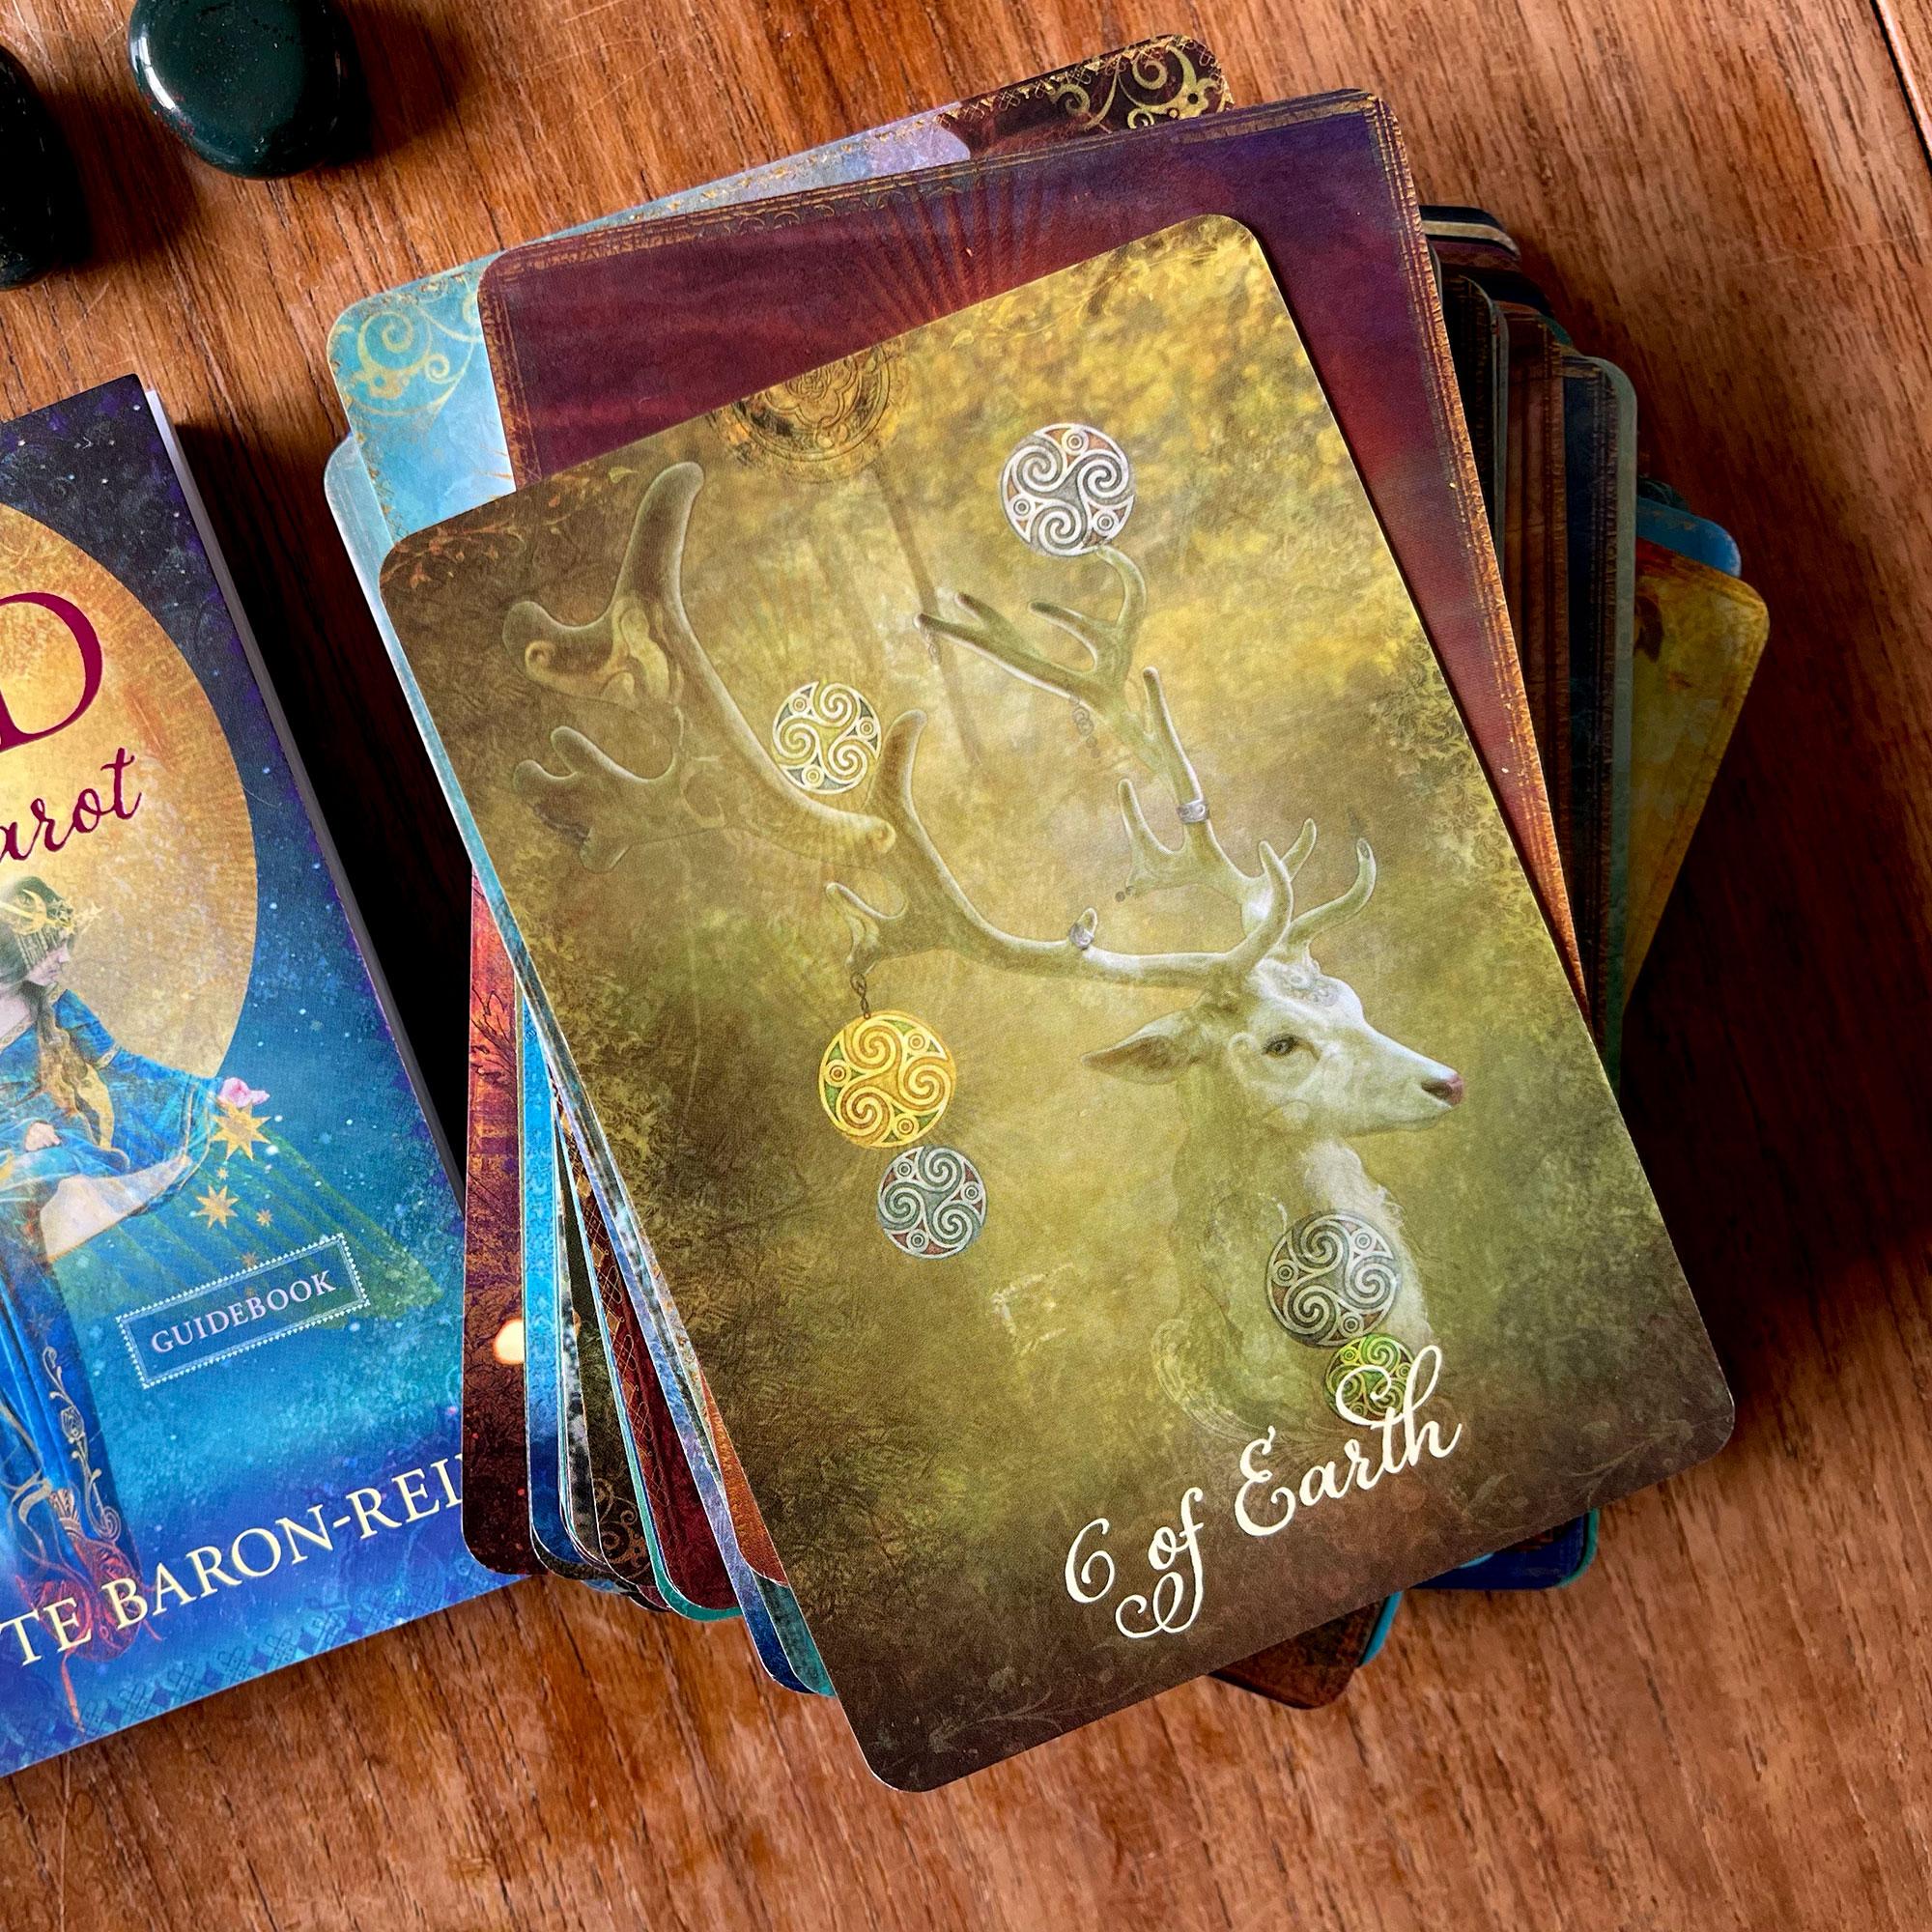 6 of earth - The Good Tarot